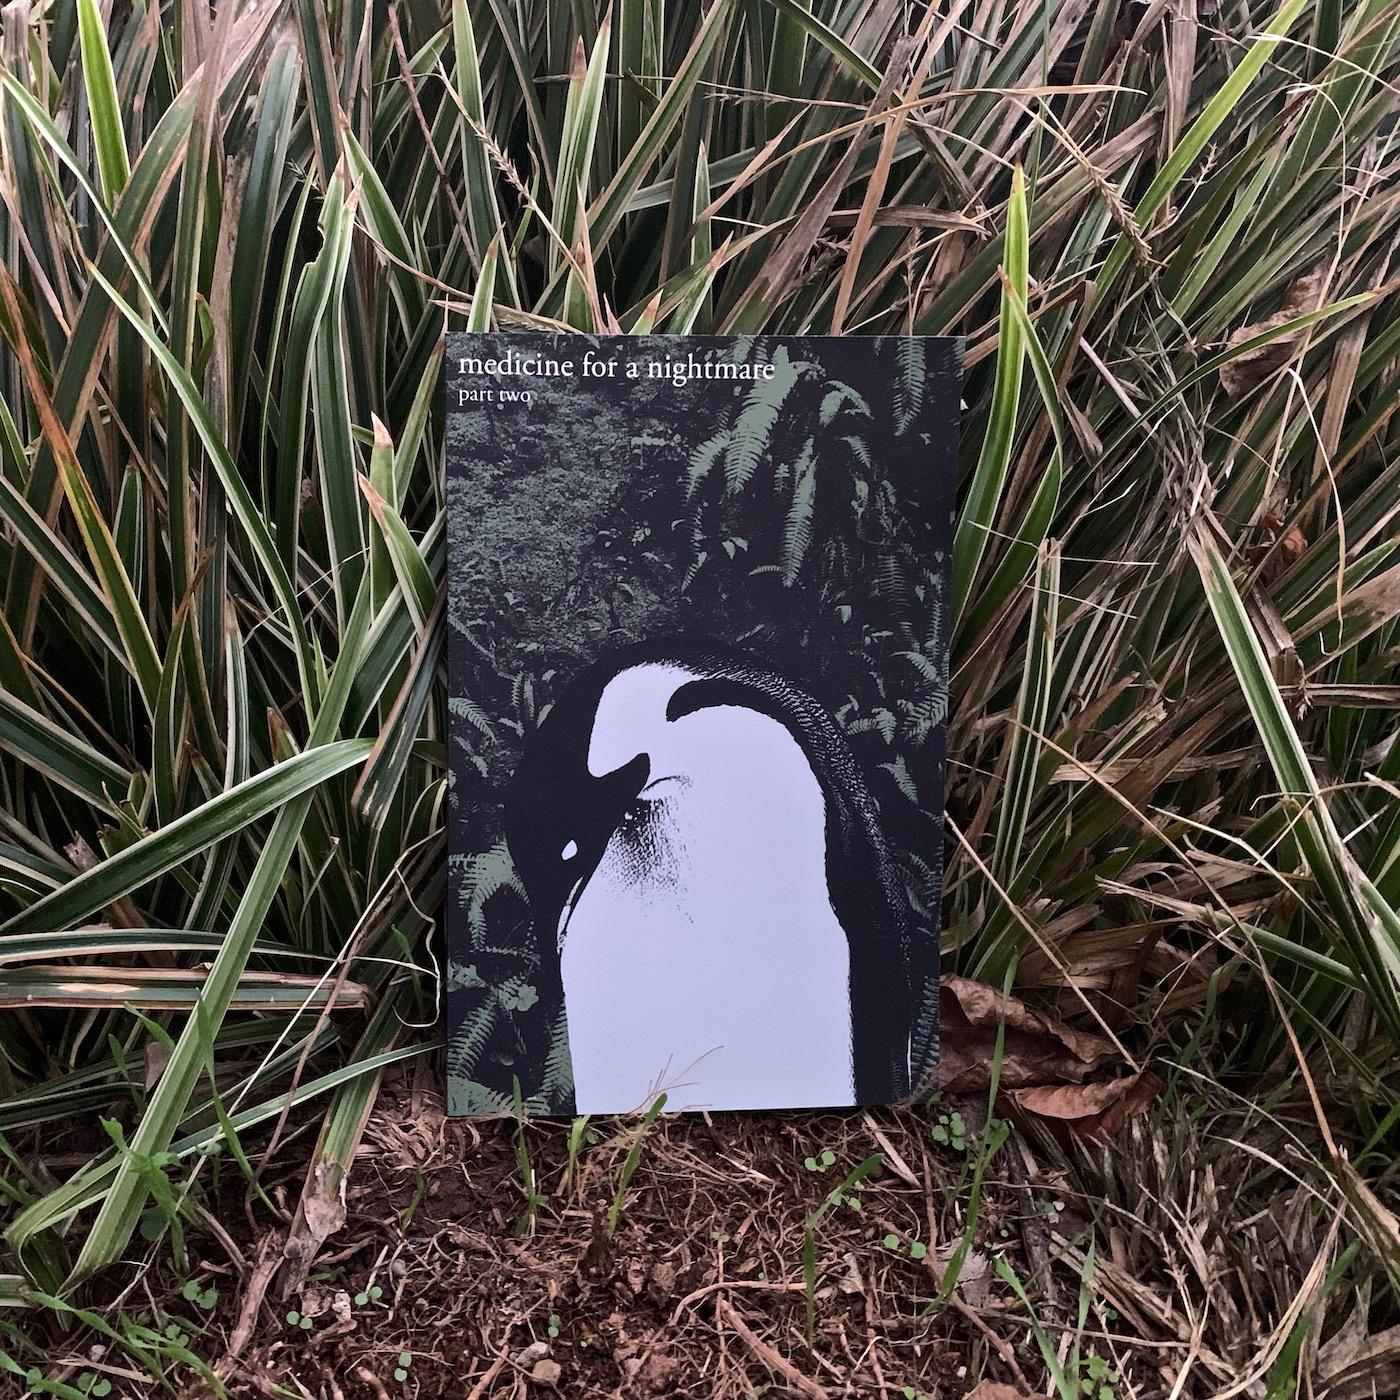 Part Two (Book & Audio Companion)